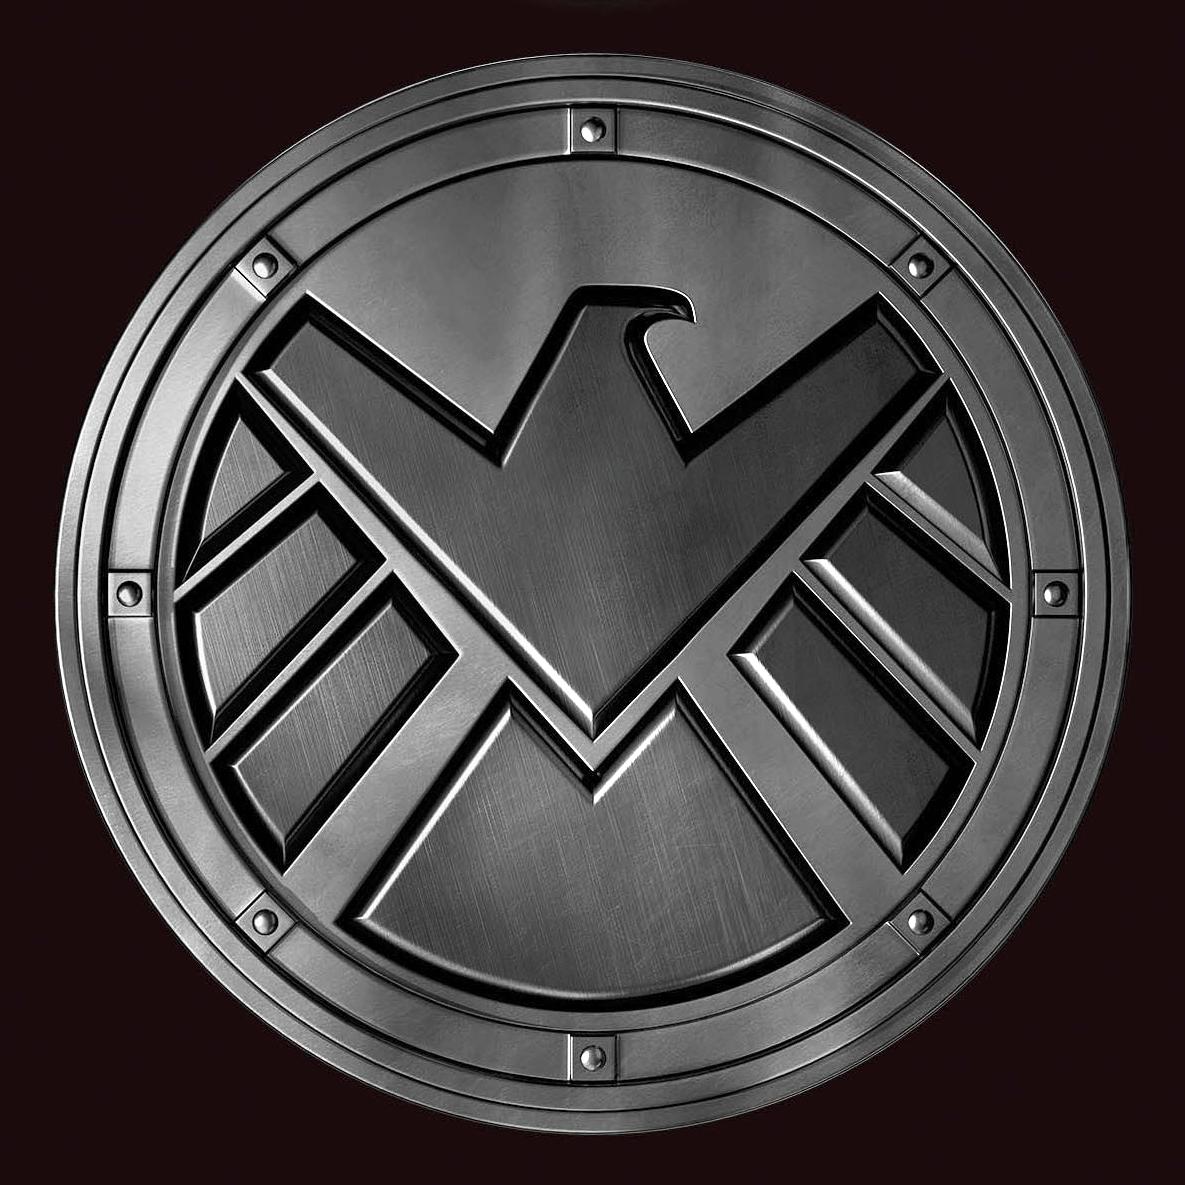 Image Shield Emblem 4g Marvel Movies Fandom Powered By Wikia